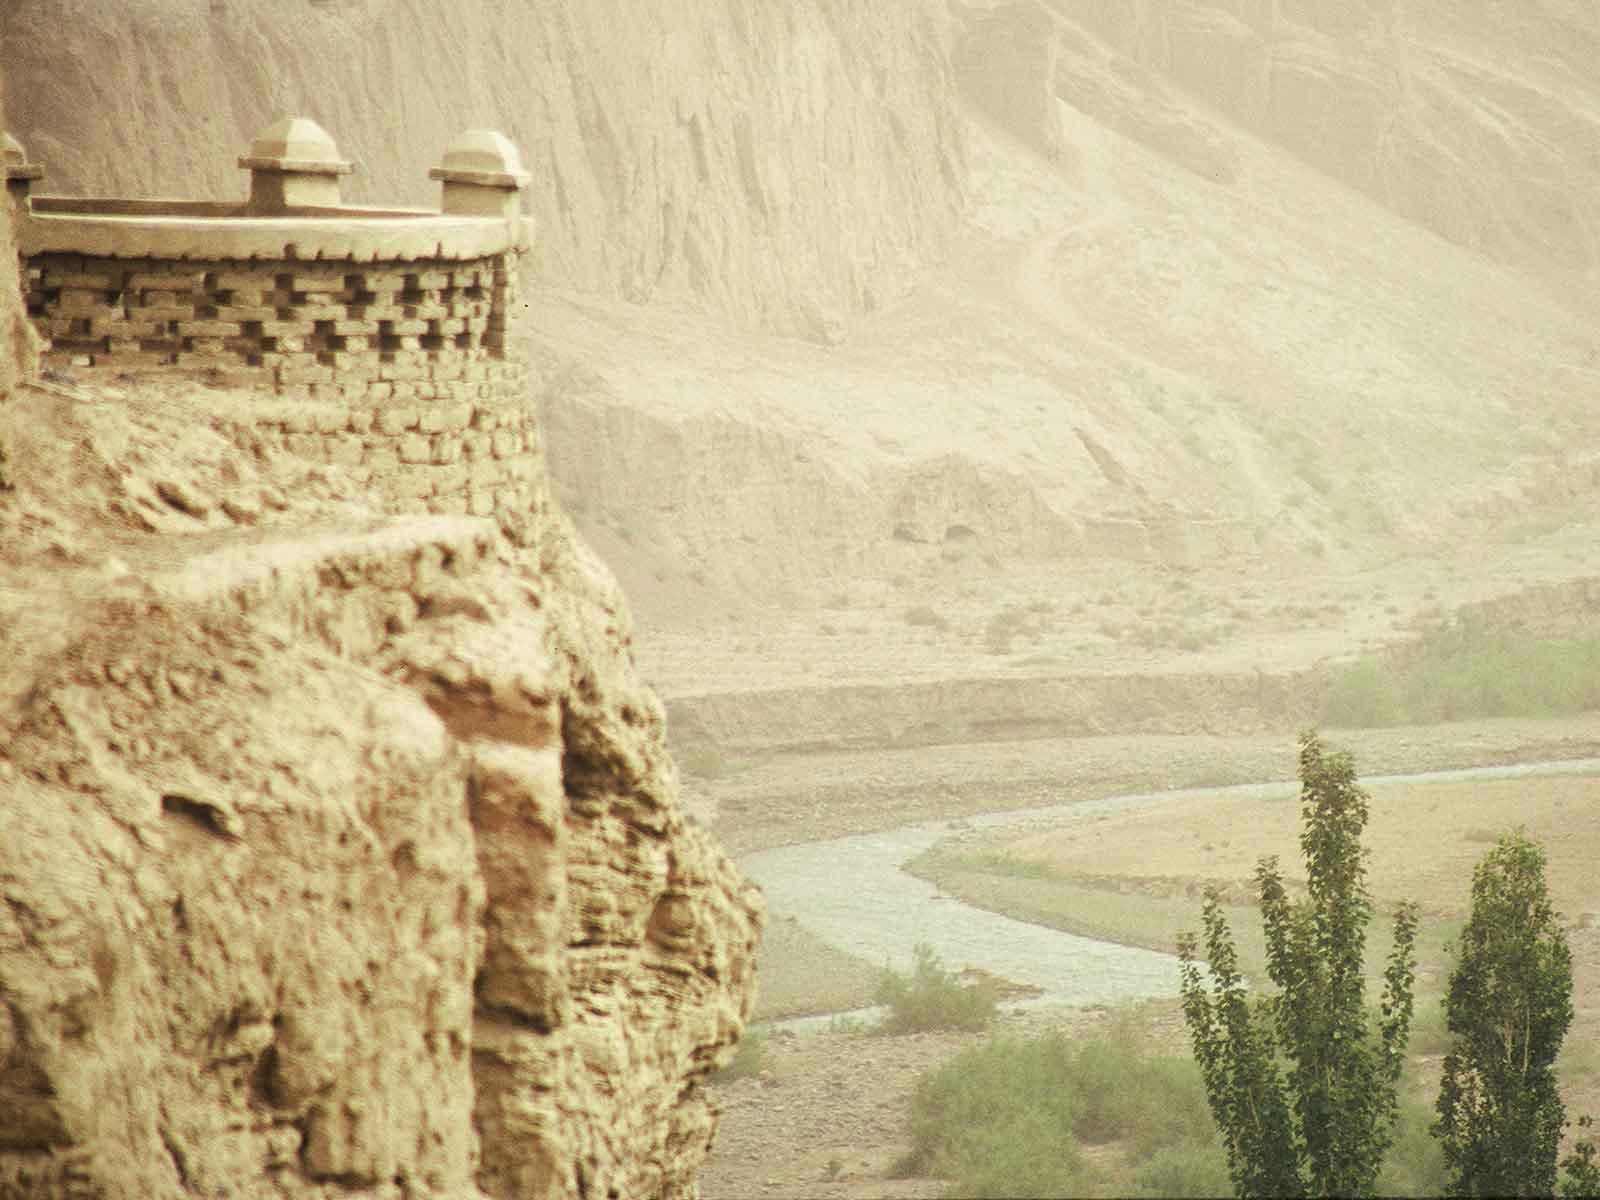 Bezeklik Thousand Buddha Caves - China Silk Road Journal - Dr Steven Andrew Martin - Research